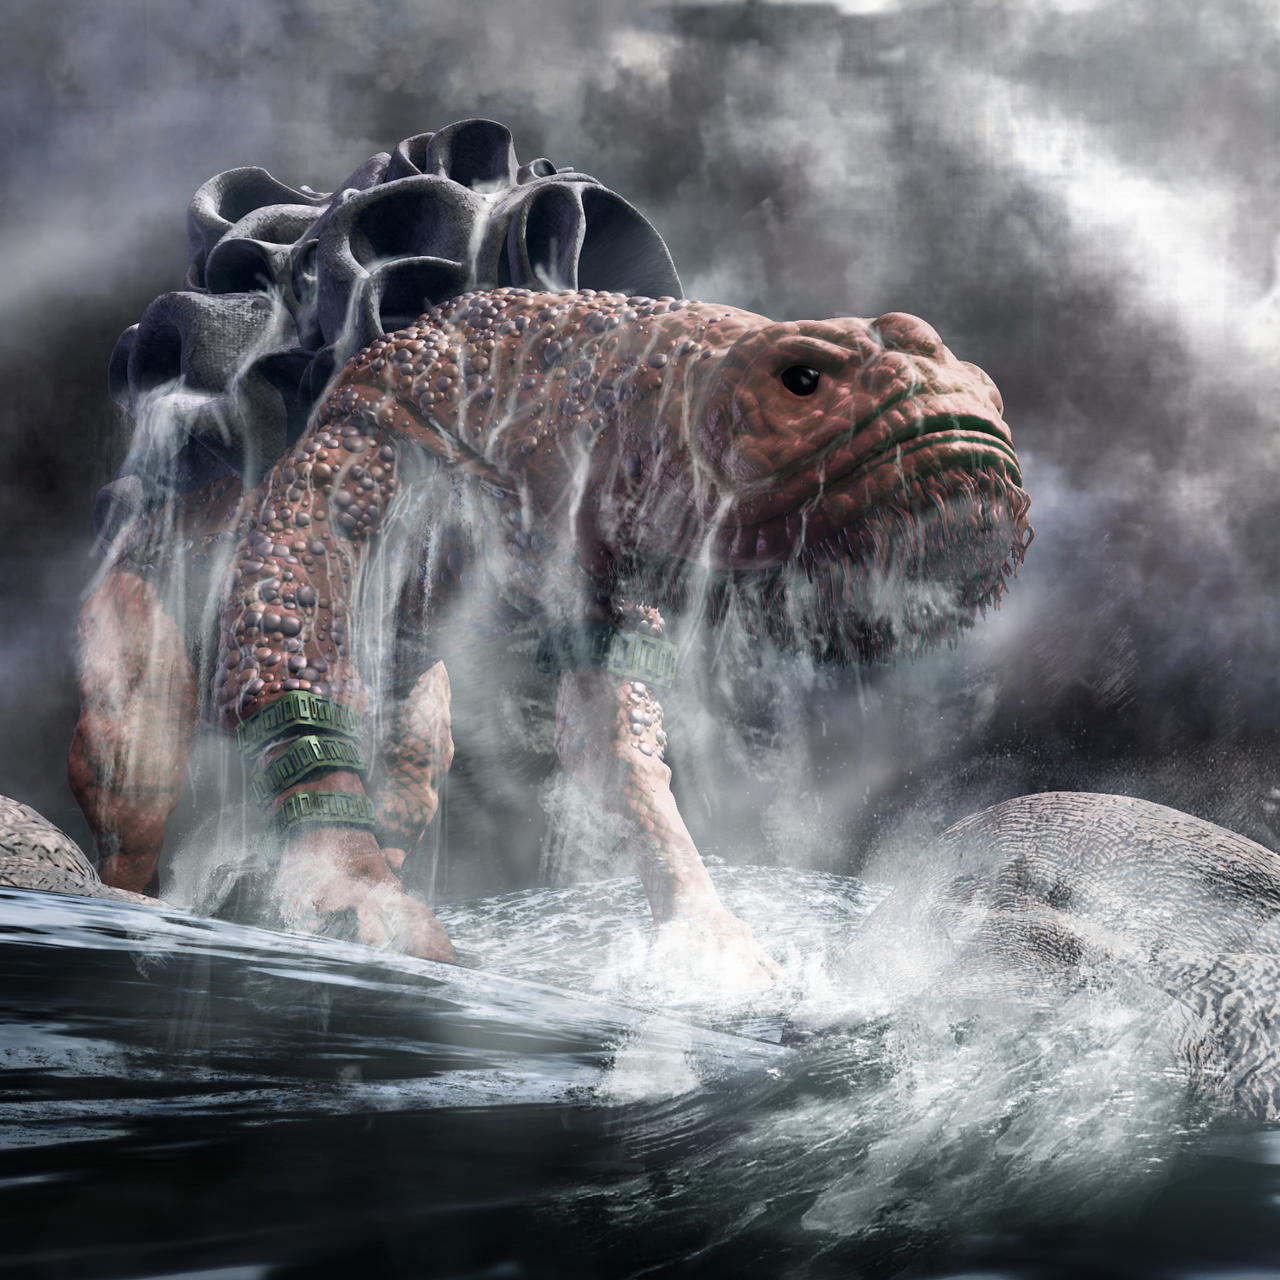 Goliathus by mekani